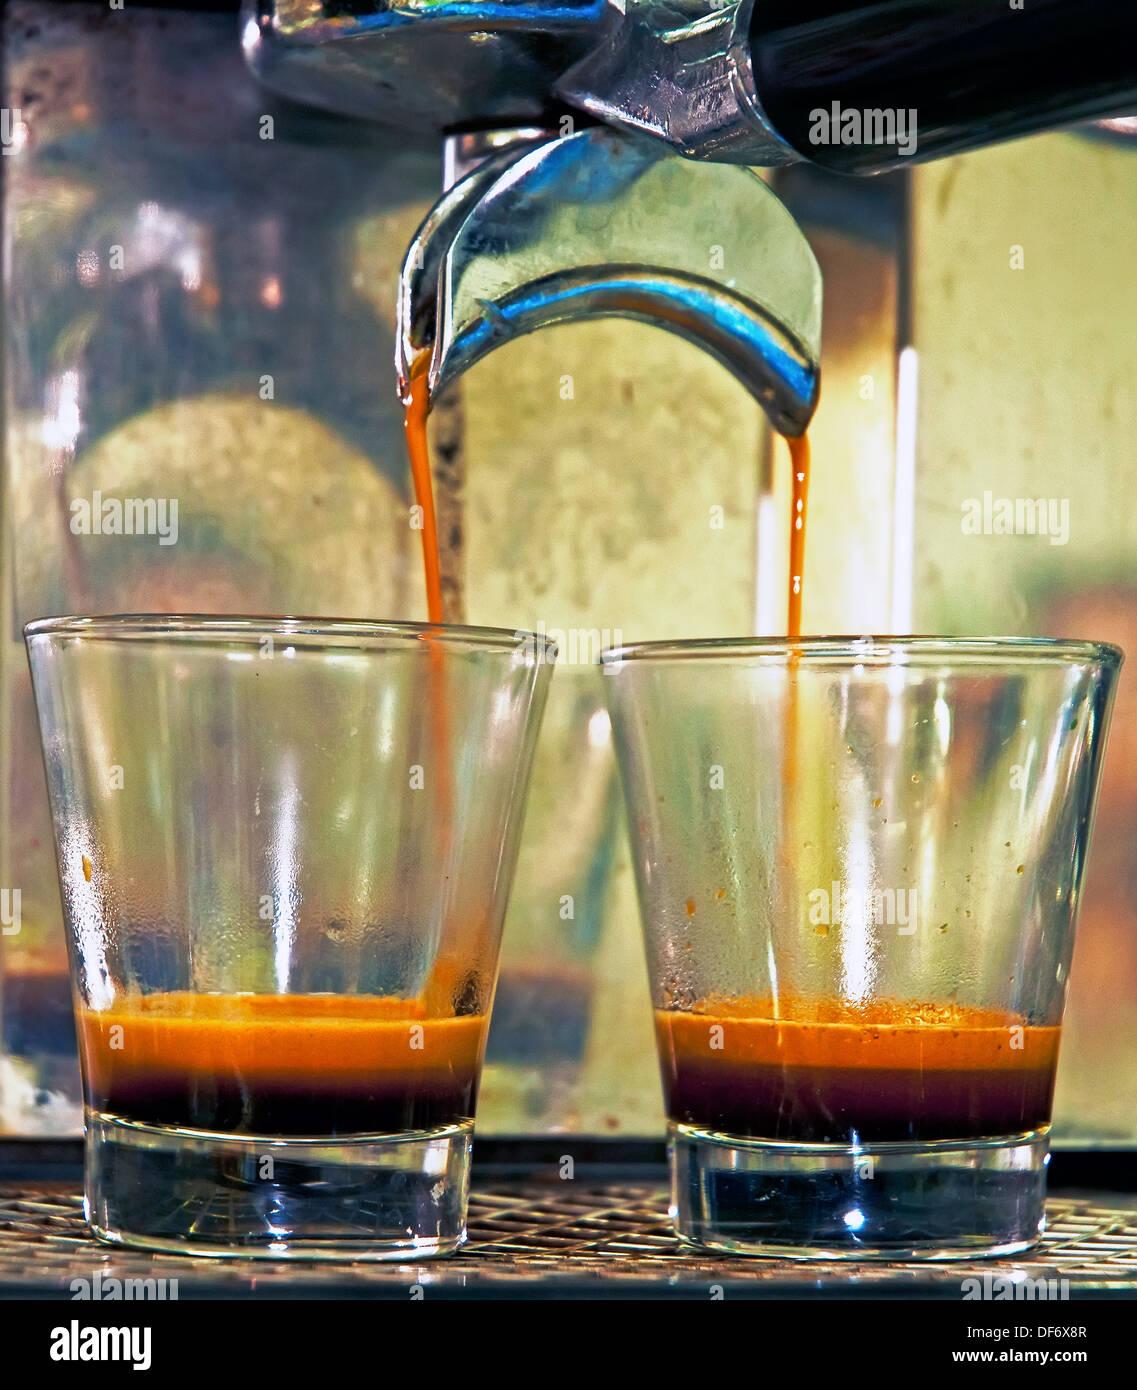 Cafetera Espresso, la cultura italiana Imagen De Stock